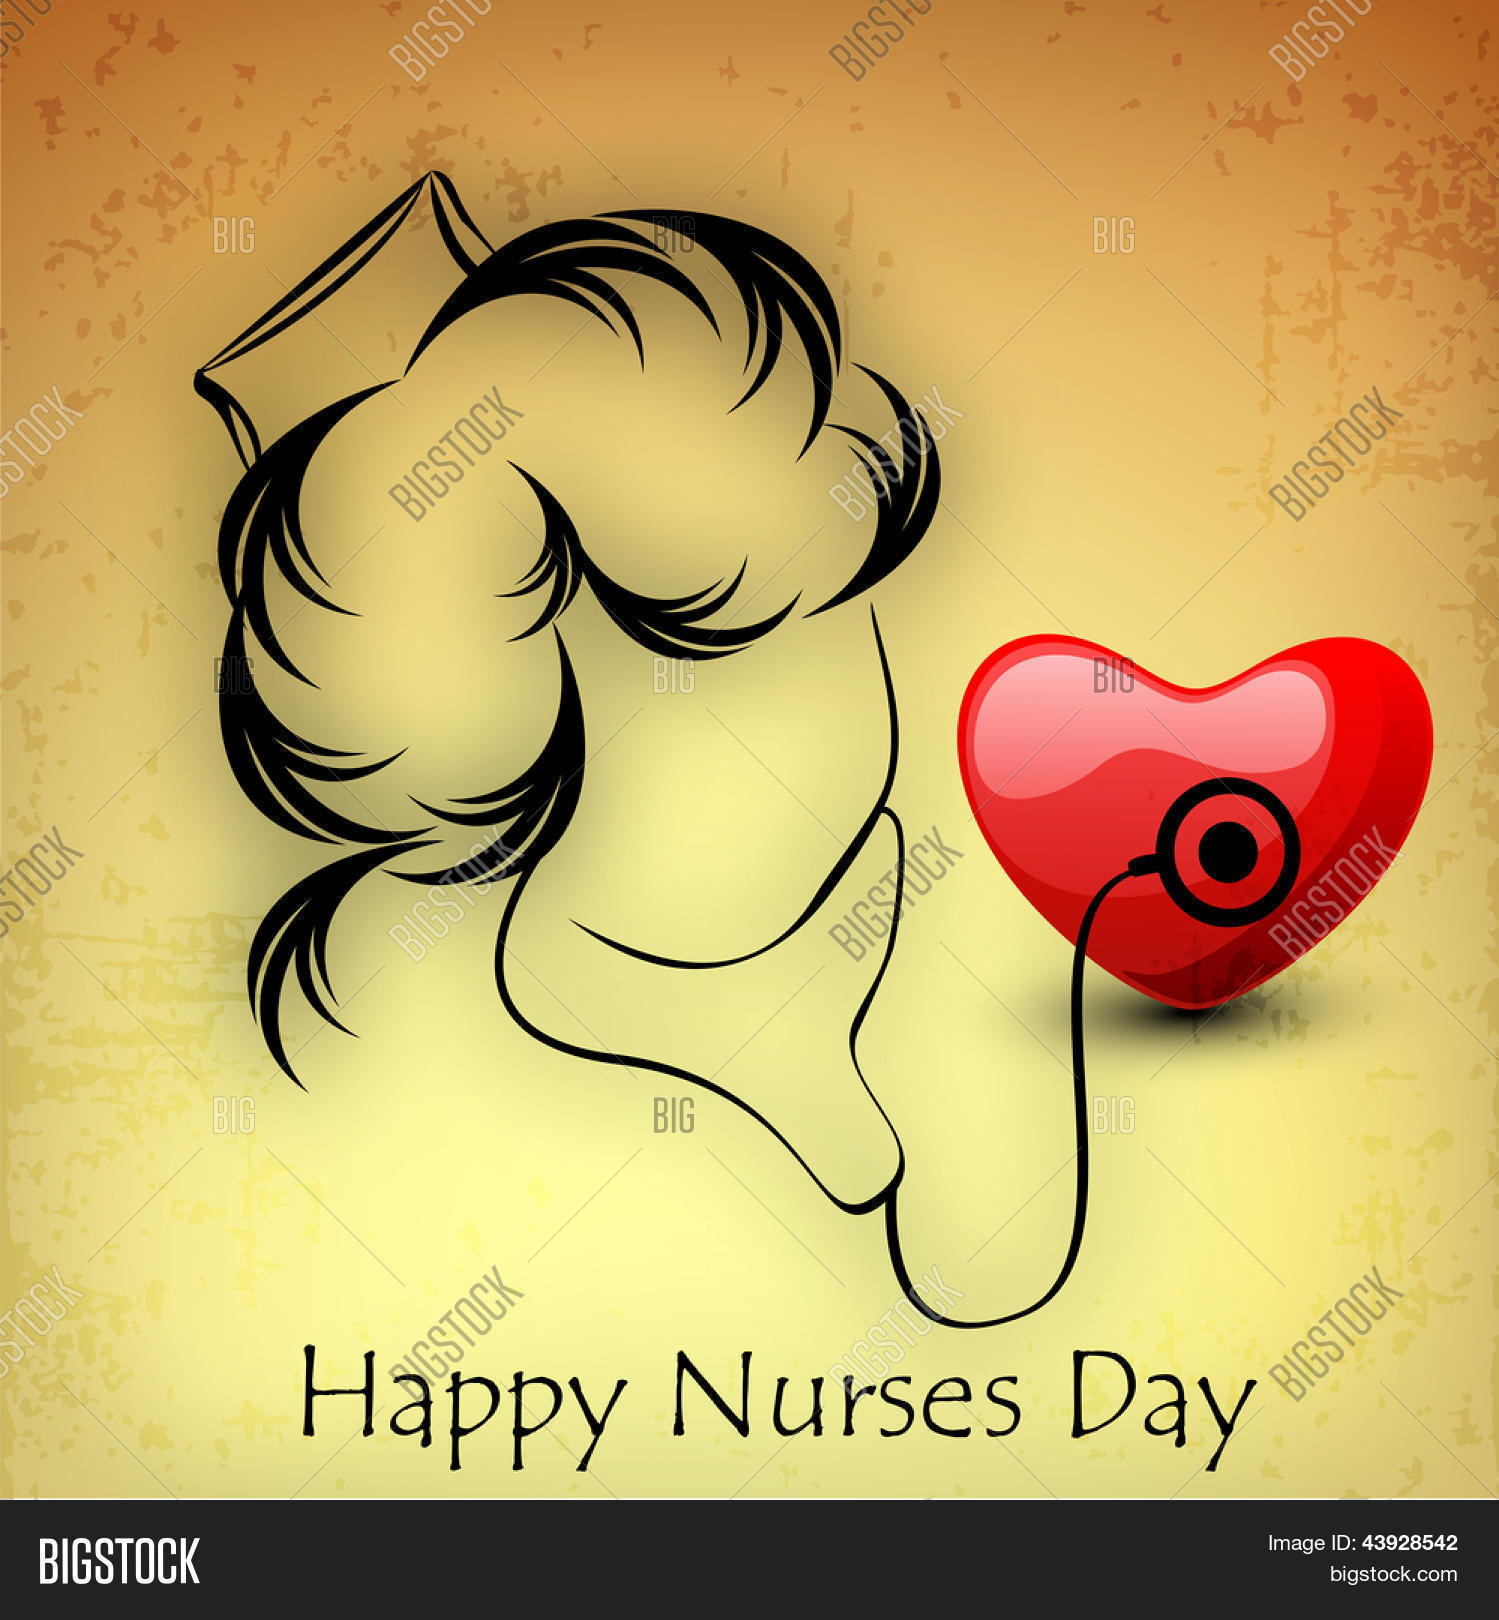 International nurse day concept with illustration of a nurse.